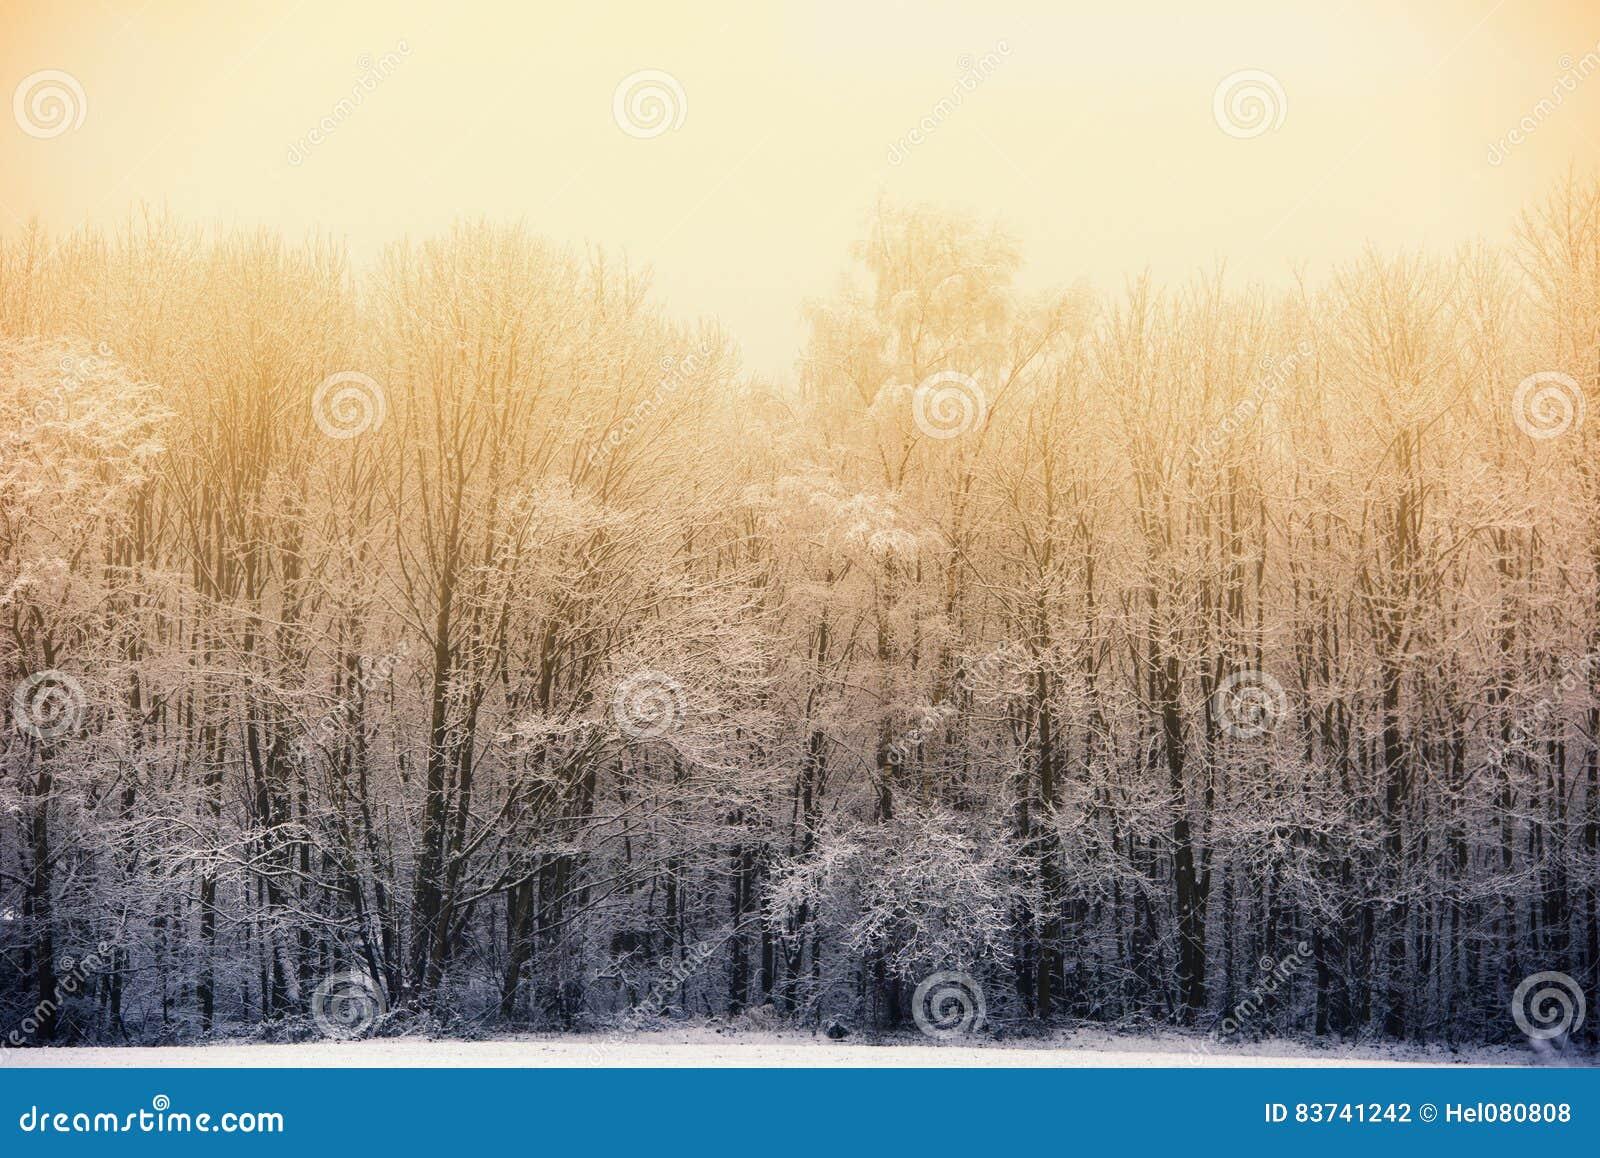 Winter phenomenon: Evening sun behind foggy winter forest